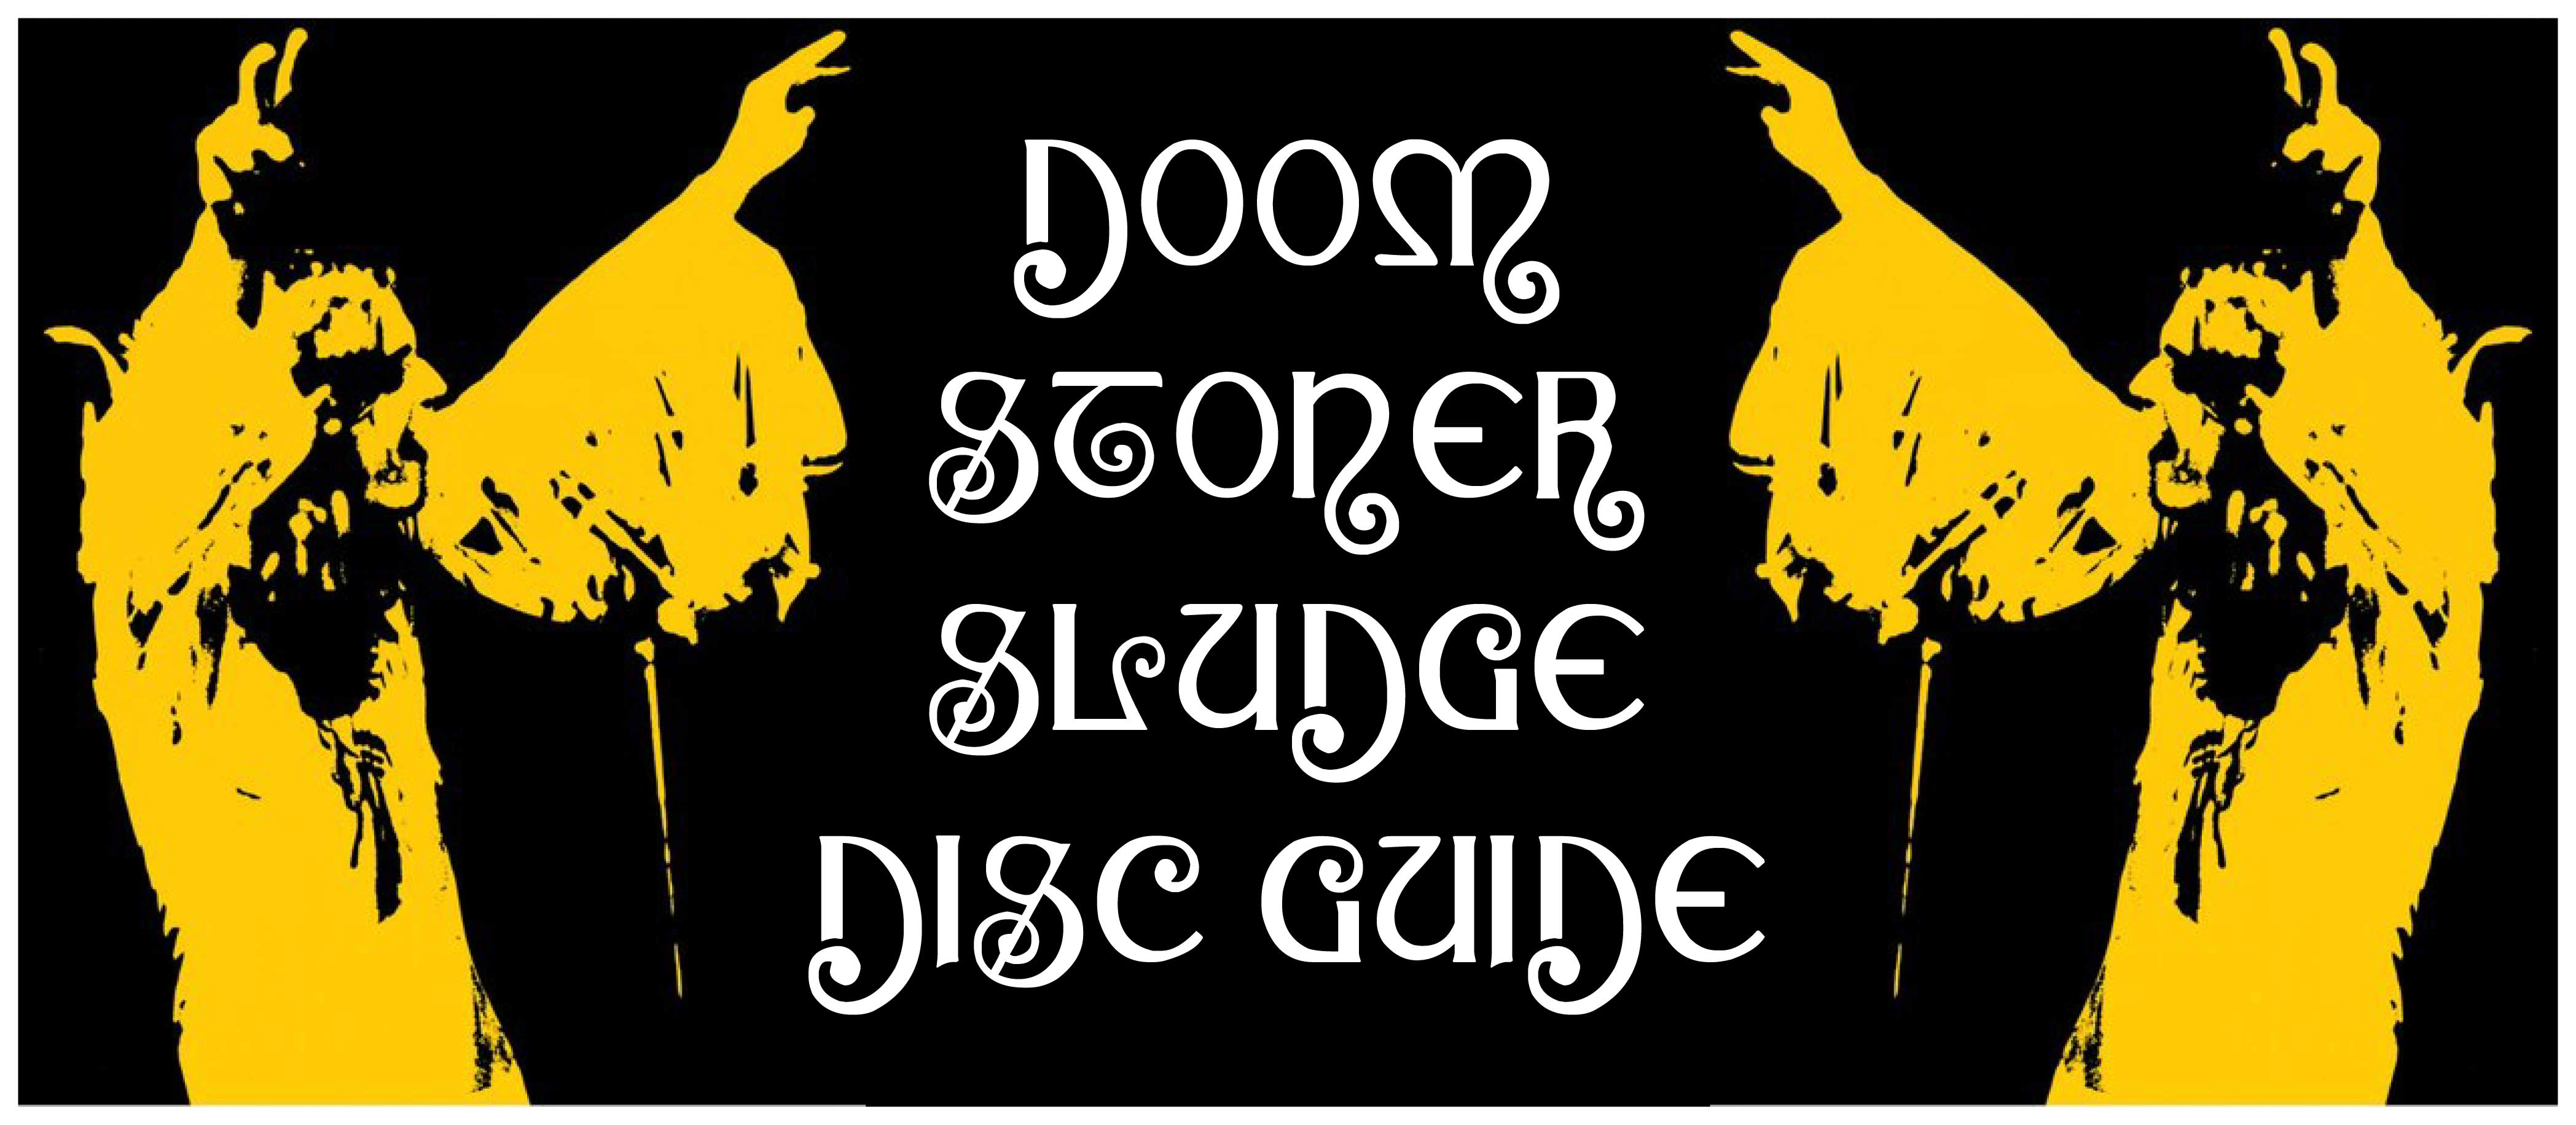 dc slider 01 - ドゥーム/ストーナー/スラッジ・ディスクガイド DOOM/STONER/SLUDGE DISC GUIDE A-Z